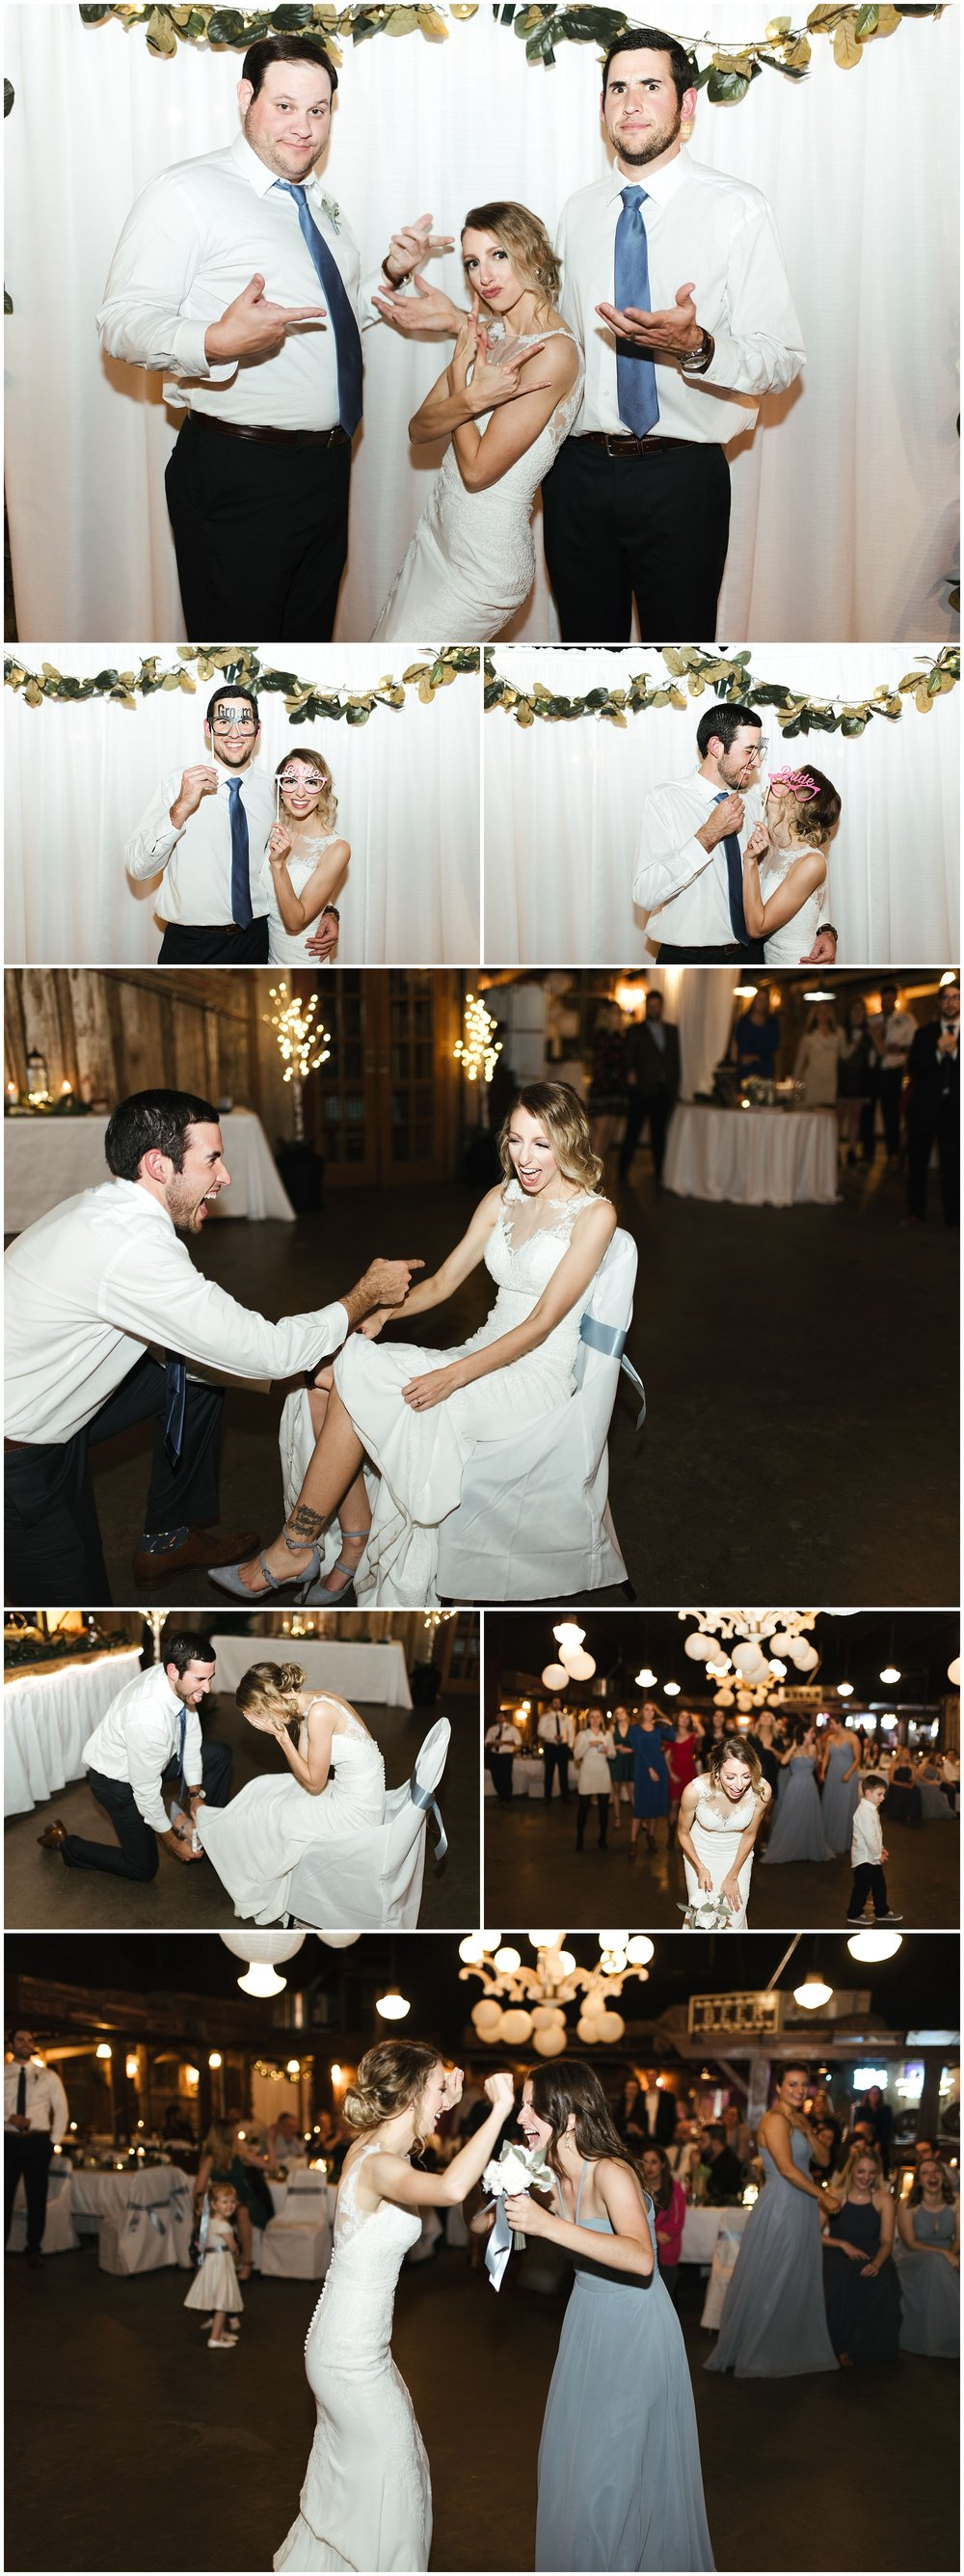 Richmond, Texas wedding | Houston Wedding Photographer | www.jordanmitchellphotography.com